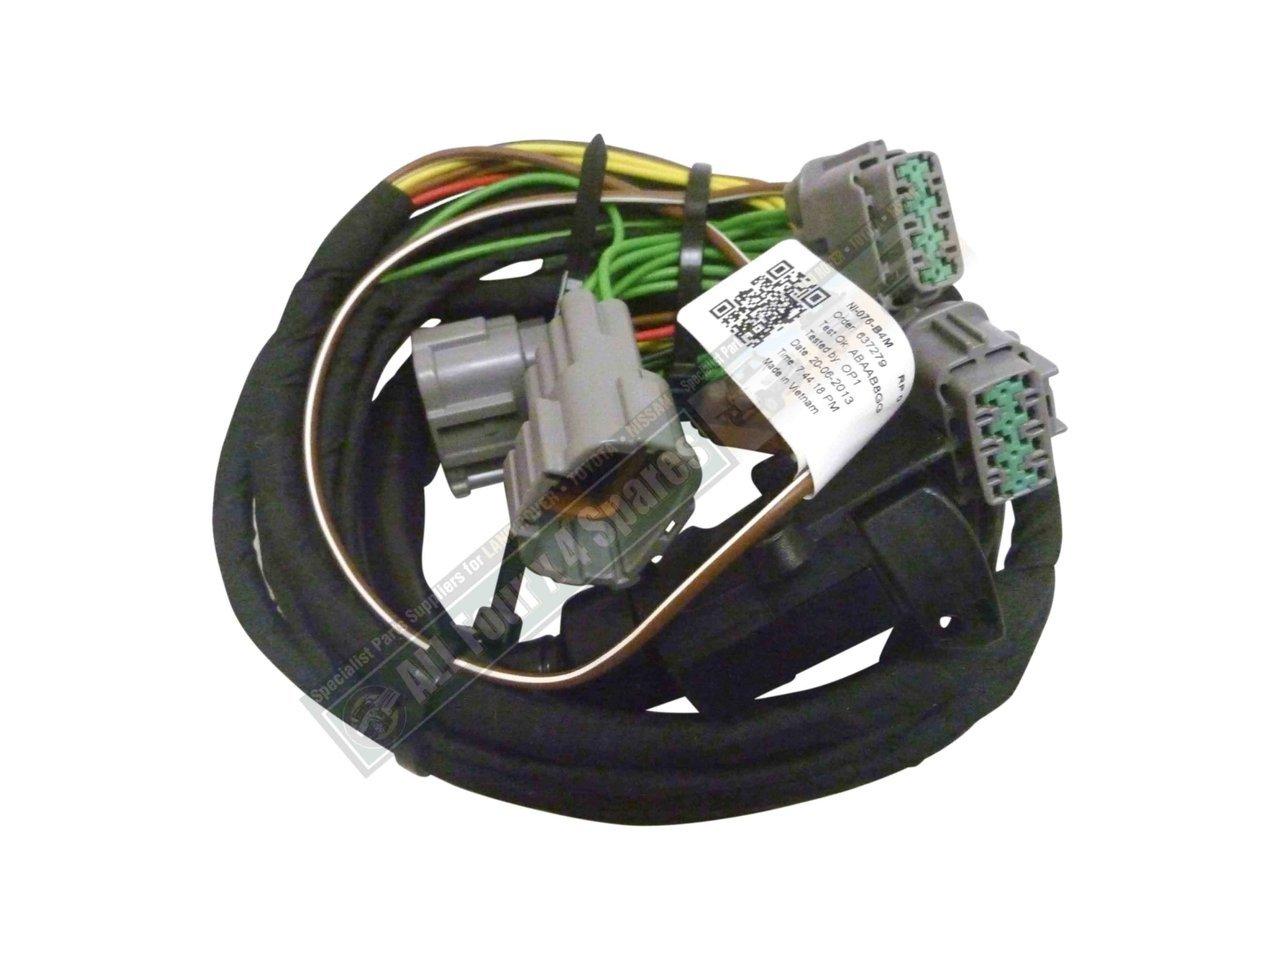 hight resolution of milford towbar wiring harness nissan navara d22 d40 2005 on nissan navara trailer wiring harness nissan navara towbar wiring harness